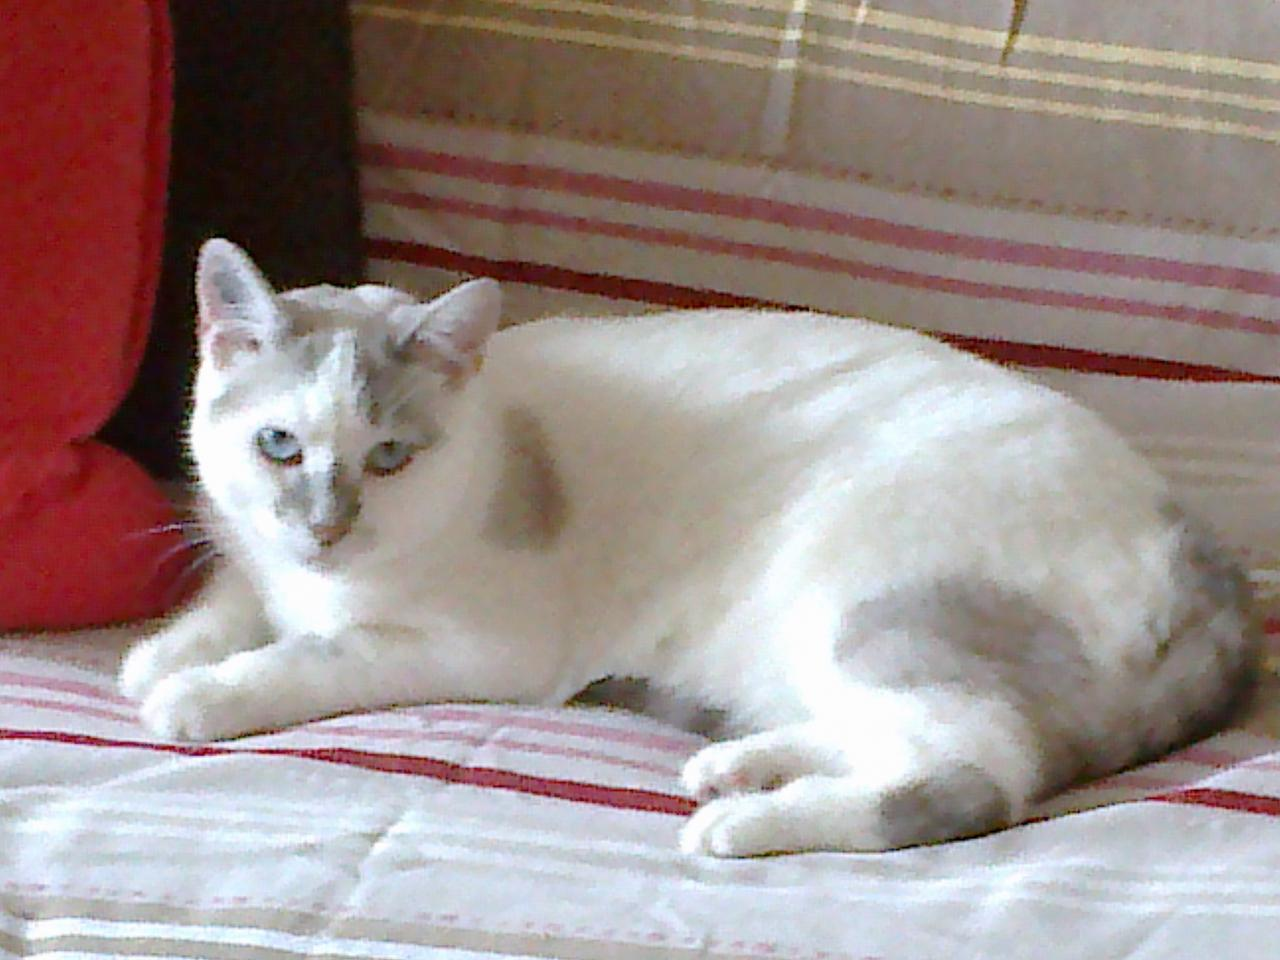 IANA - F - Née le 01/07/2012 - Adoptée en Avril 2014